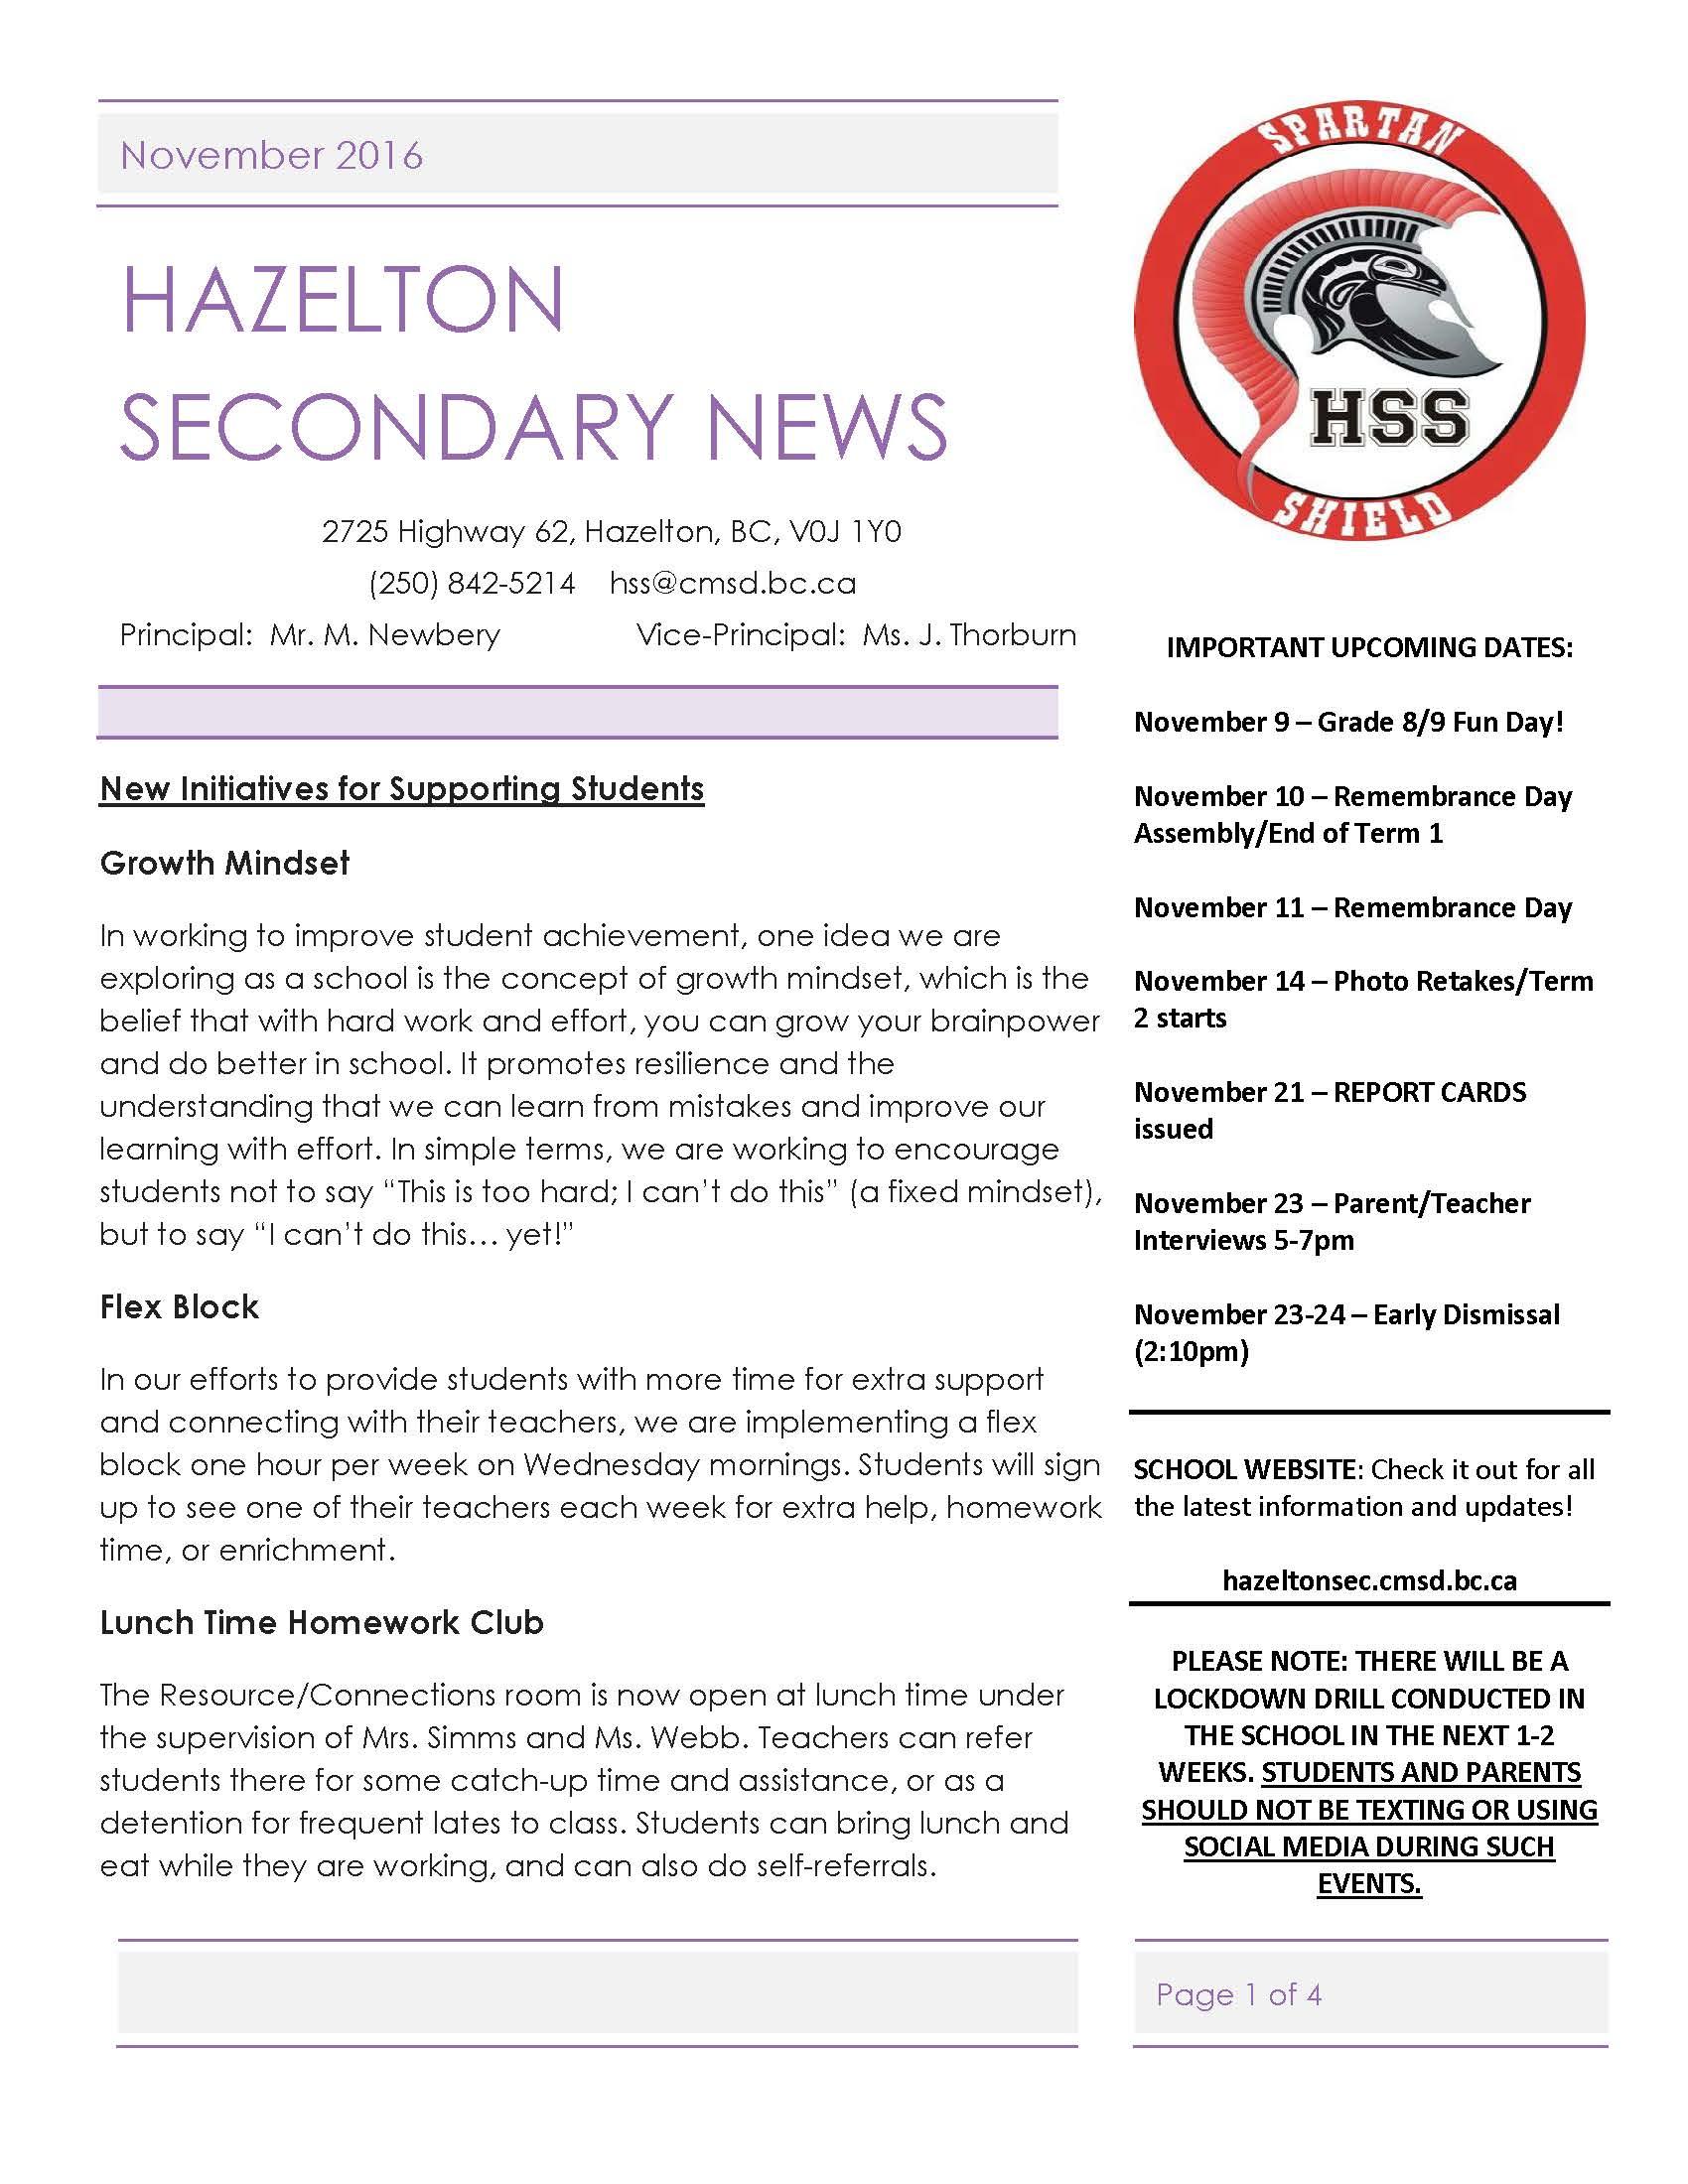 november-2016-newsletter_page_1